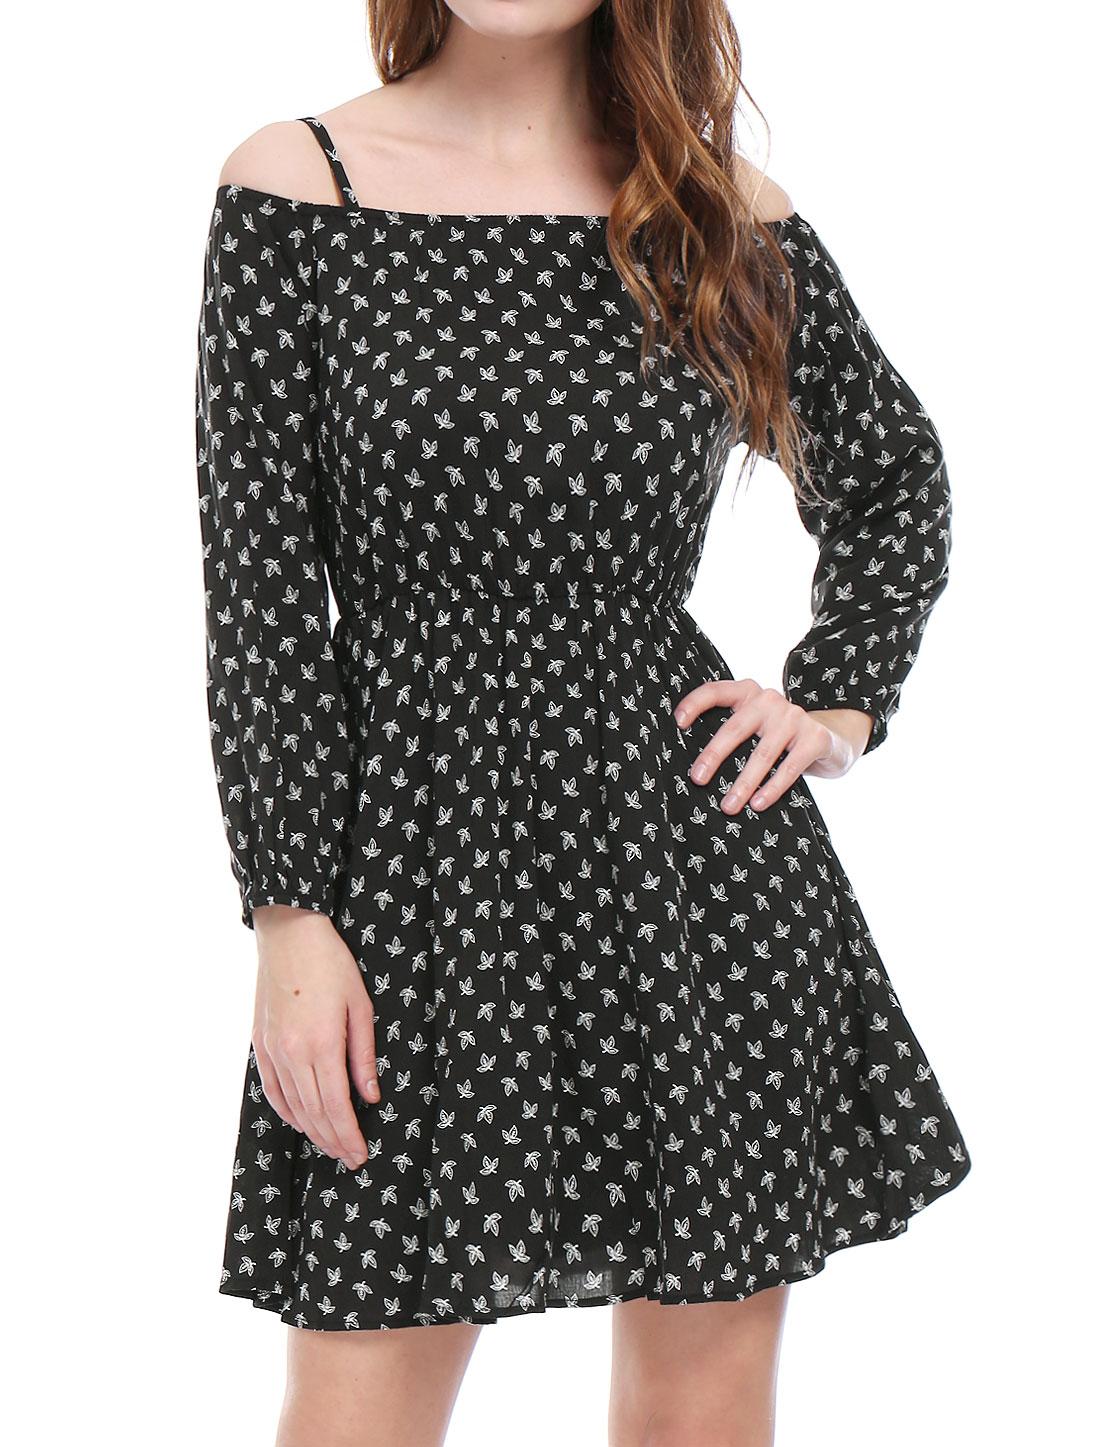 Women Long Sleeves Cold Shoulder Spaghetti Straps Tunic Dress Black XL